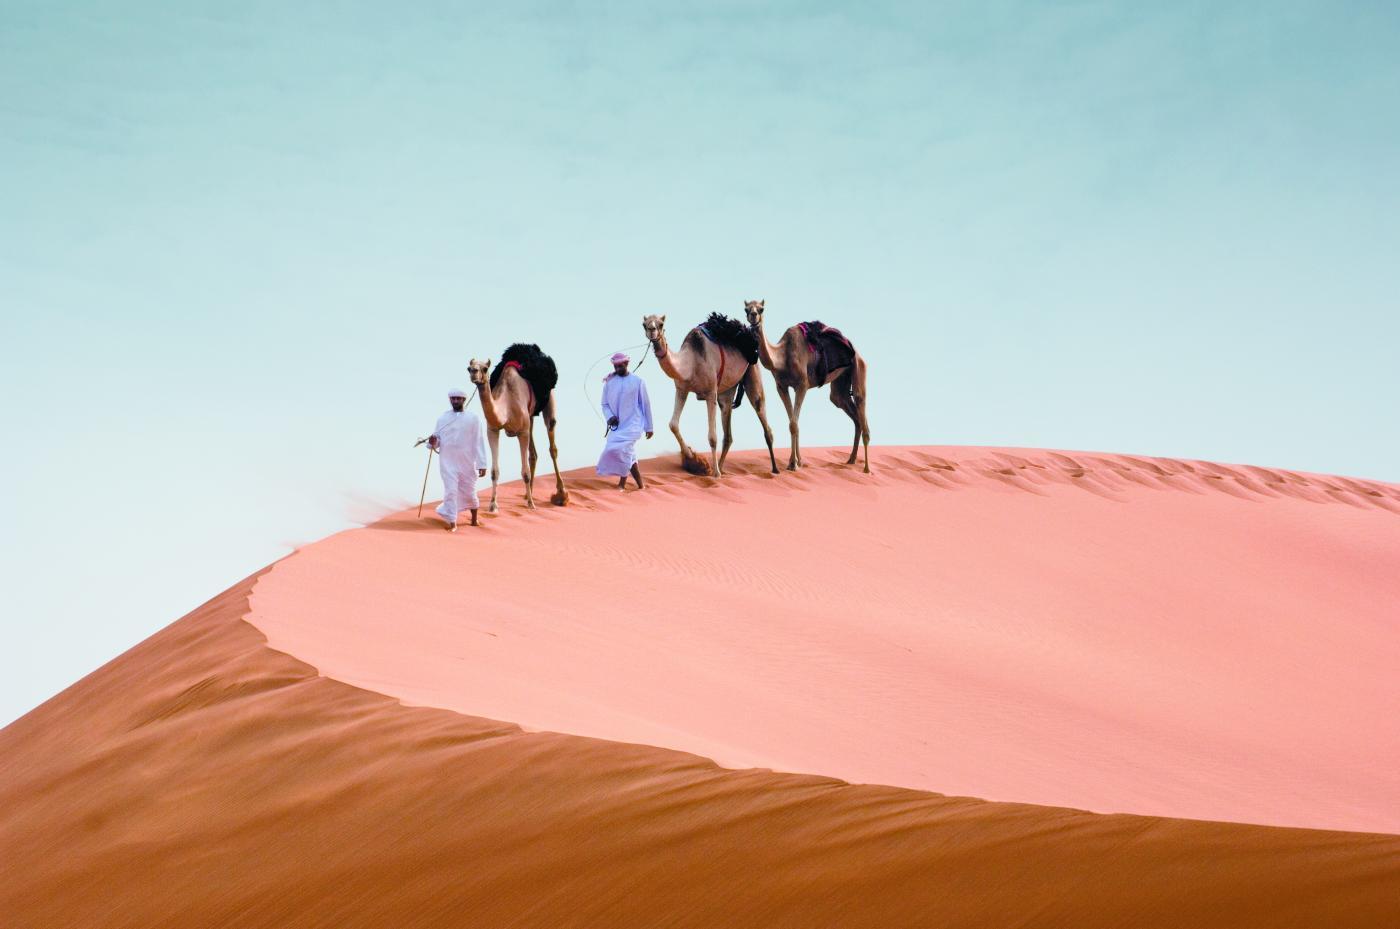 voyage-de-legende-balade-aventure-chameau-dans-desert-d-abu-dhabi